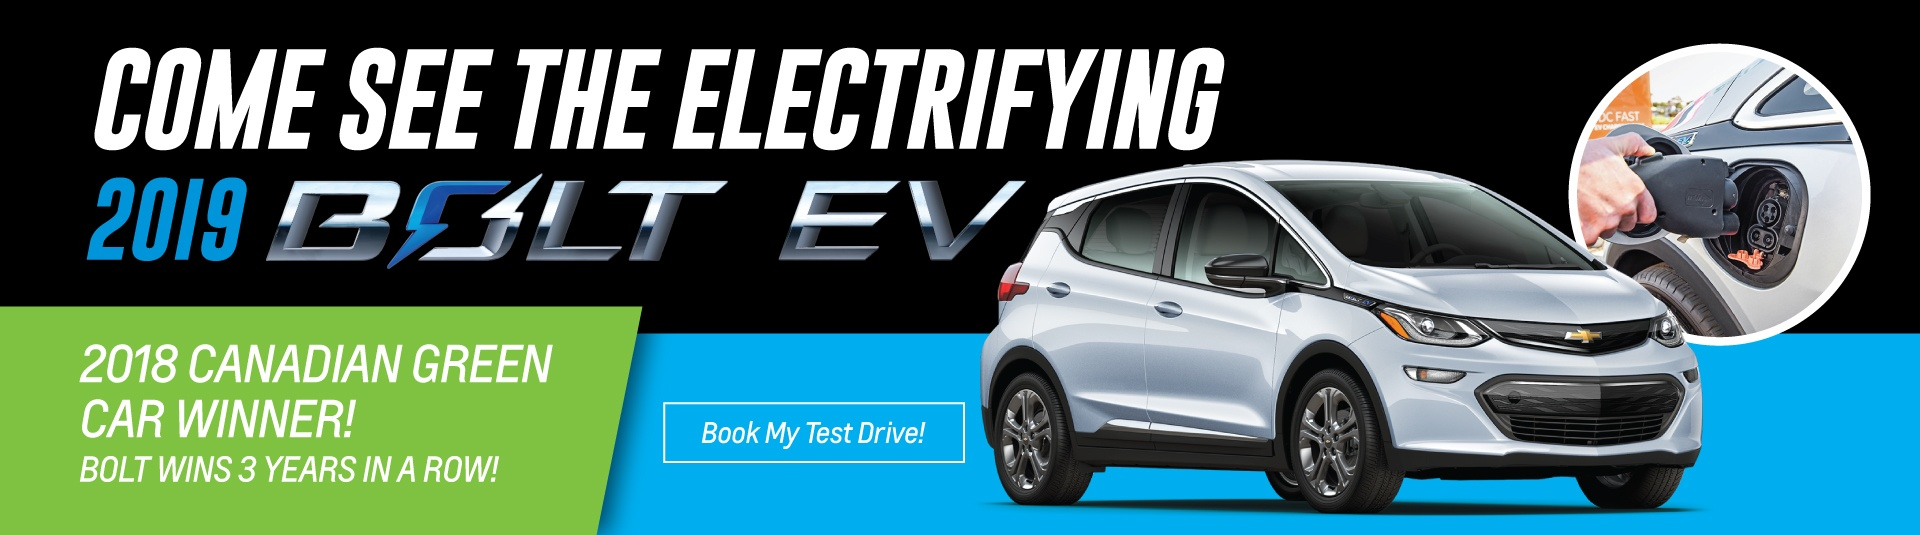 2019 Chevrolet Bolt EV in Toronto